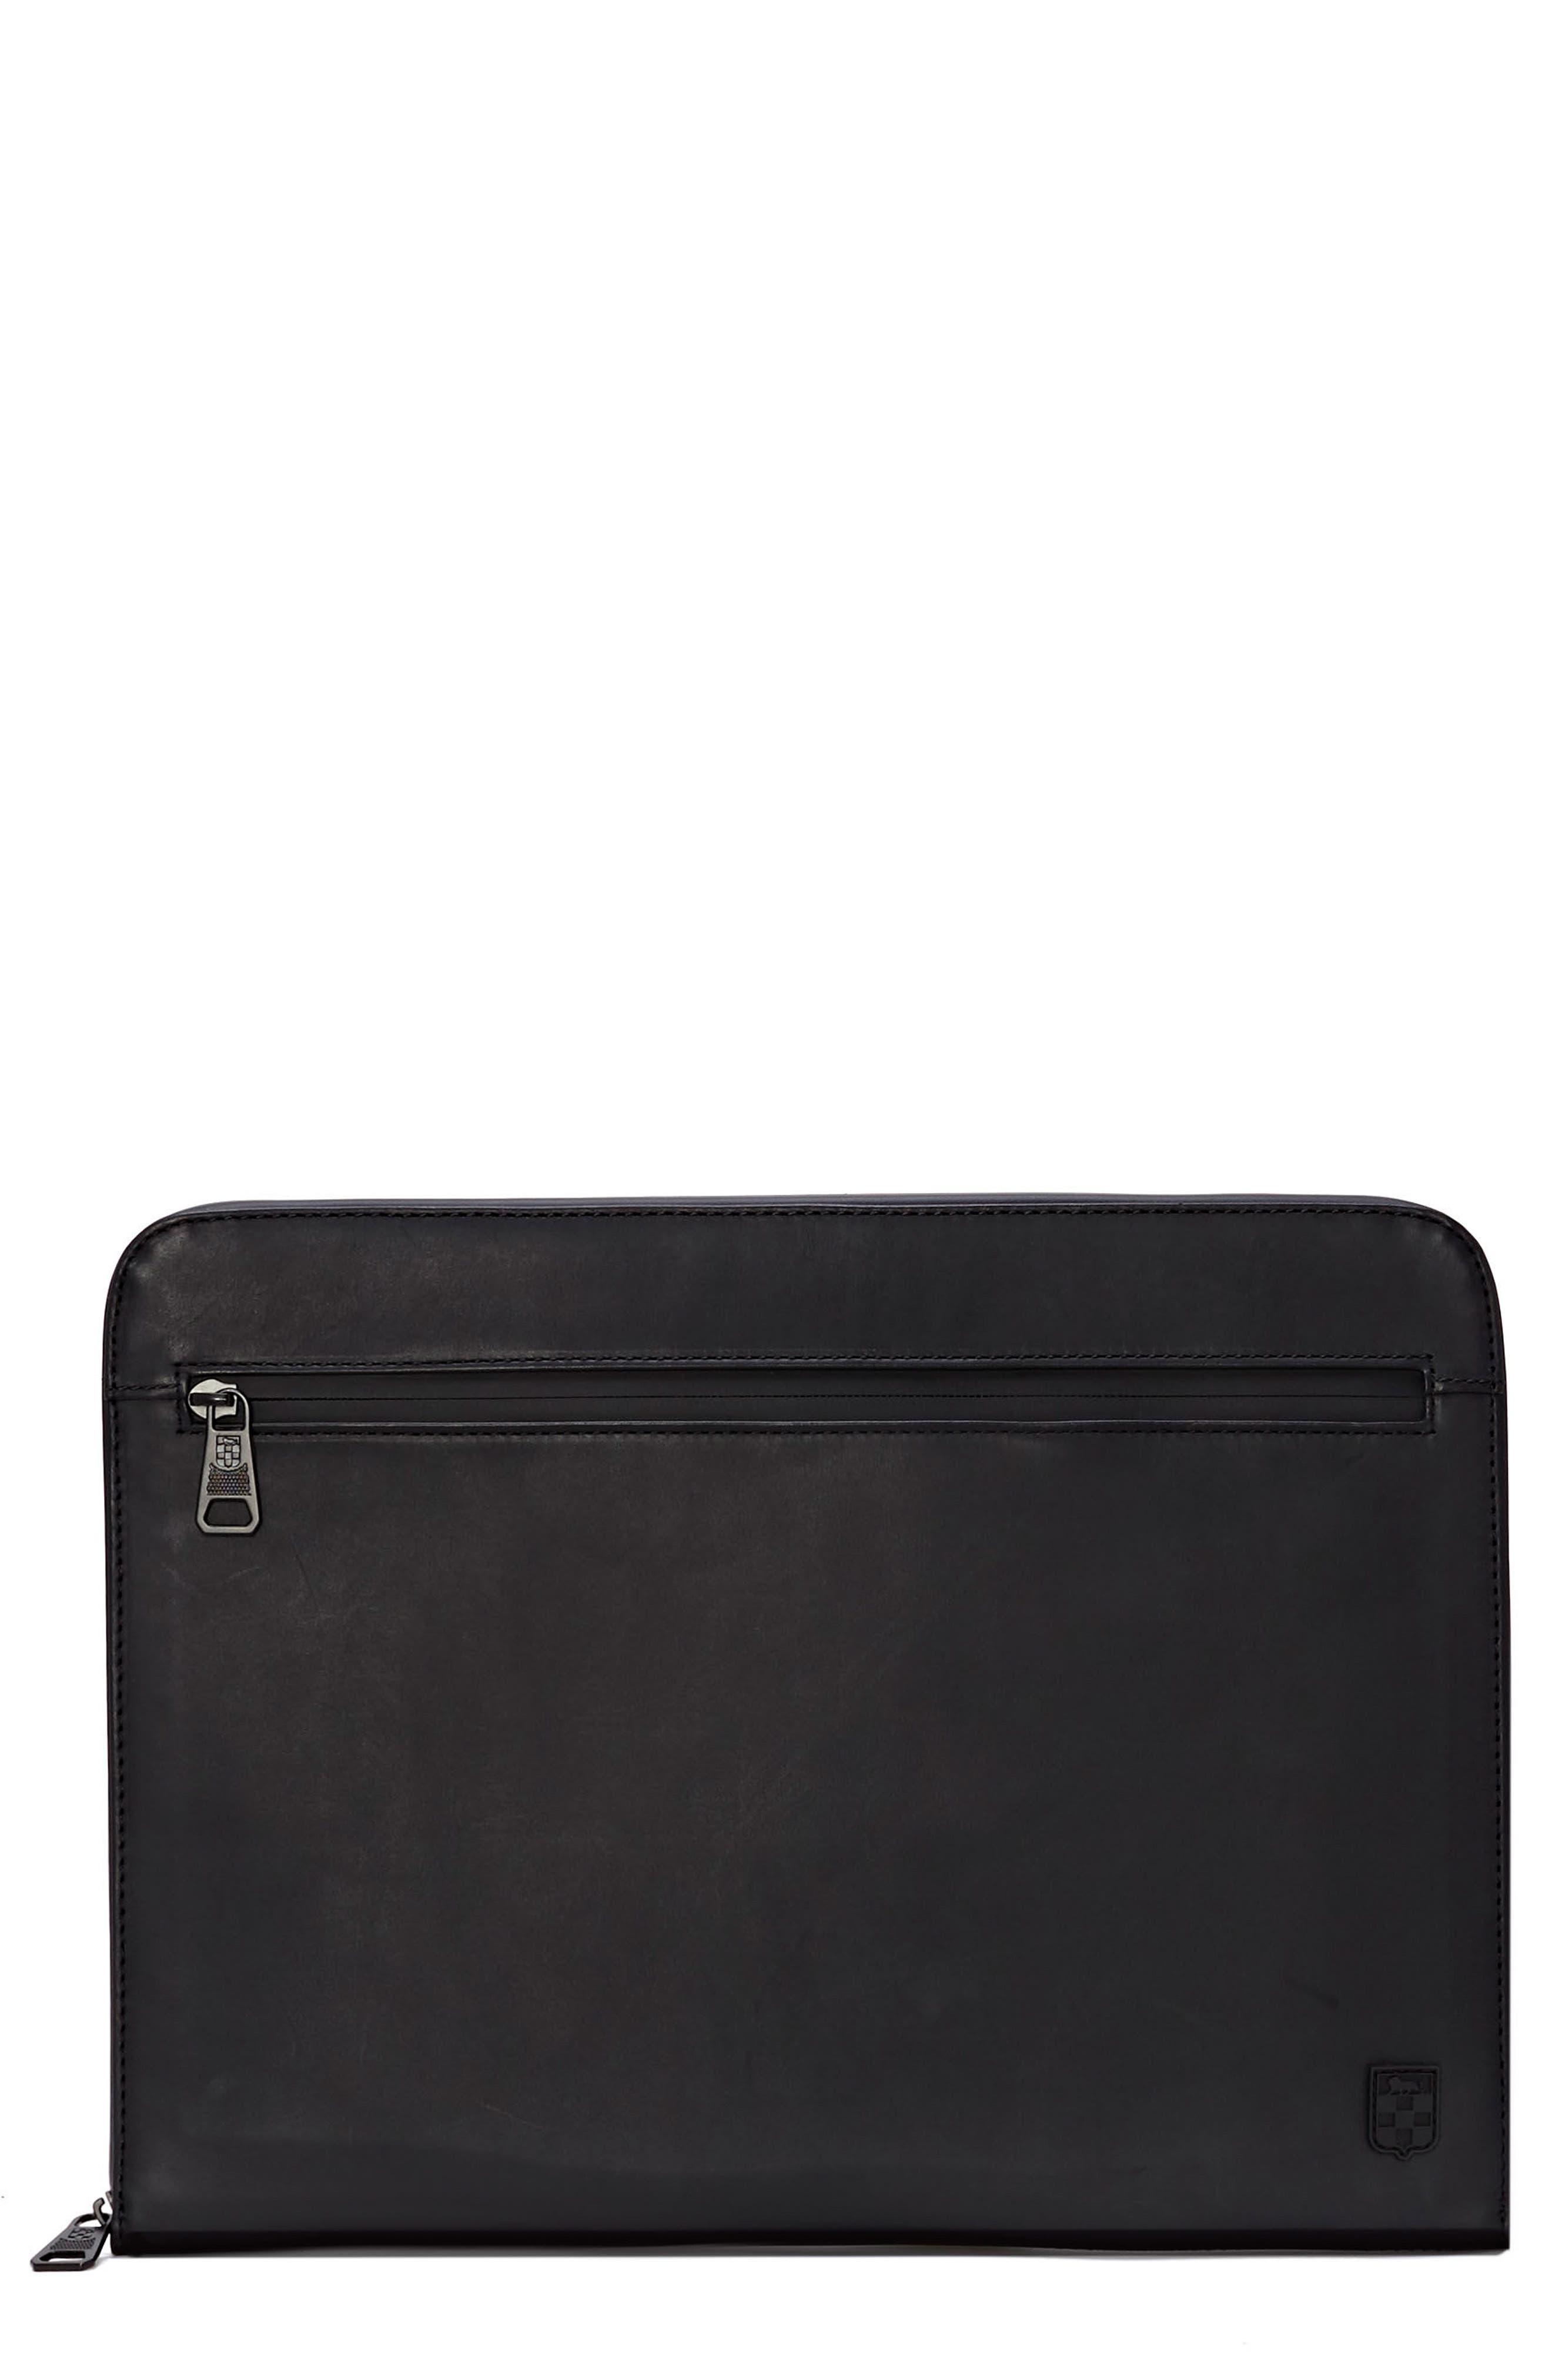 Alternate Image 1 Selected - Vince Camuto Purio Leather Portfolio